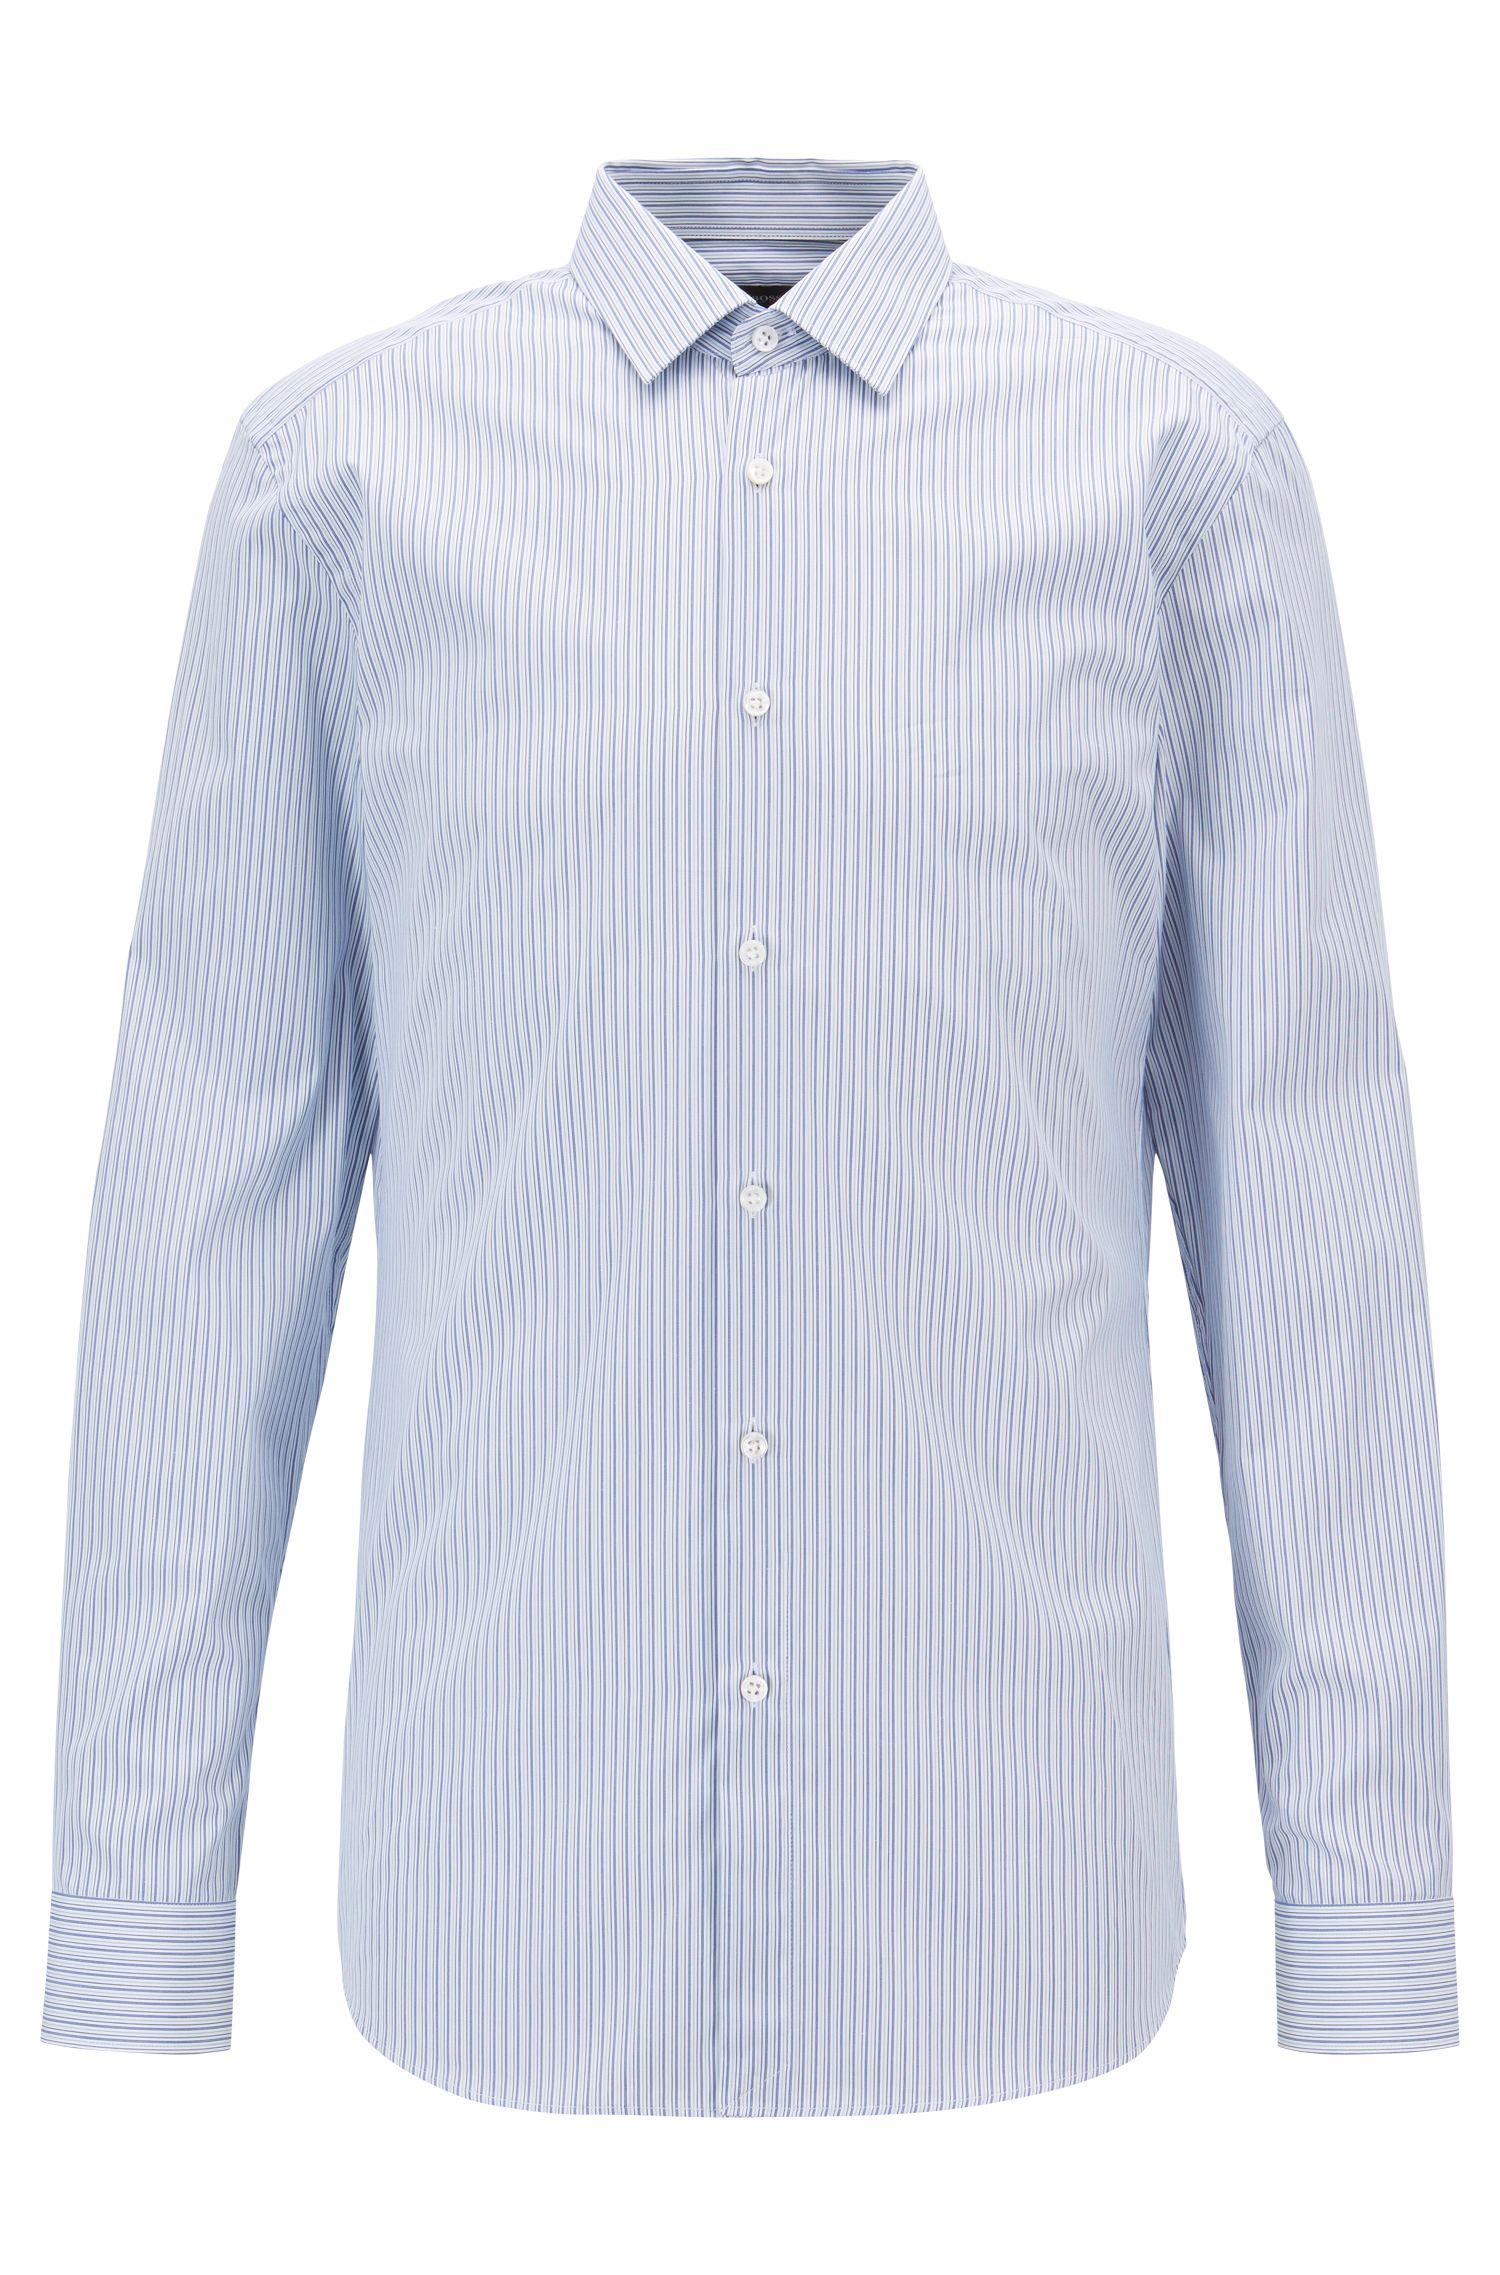 Slim-fit shirt in striped cotton poplin, Blue